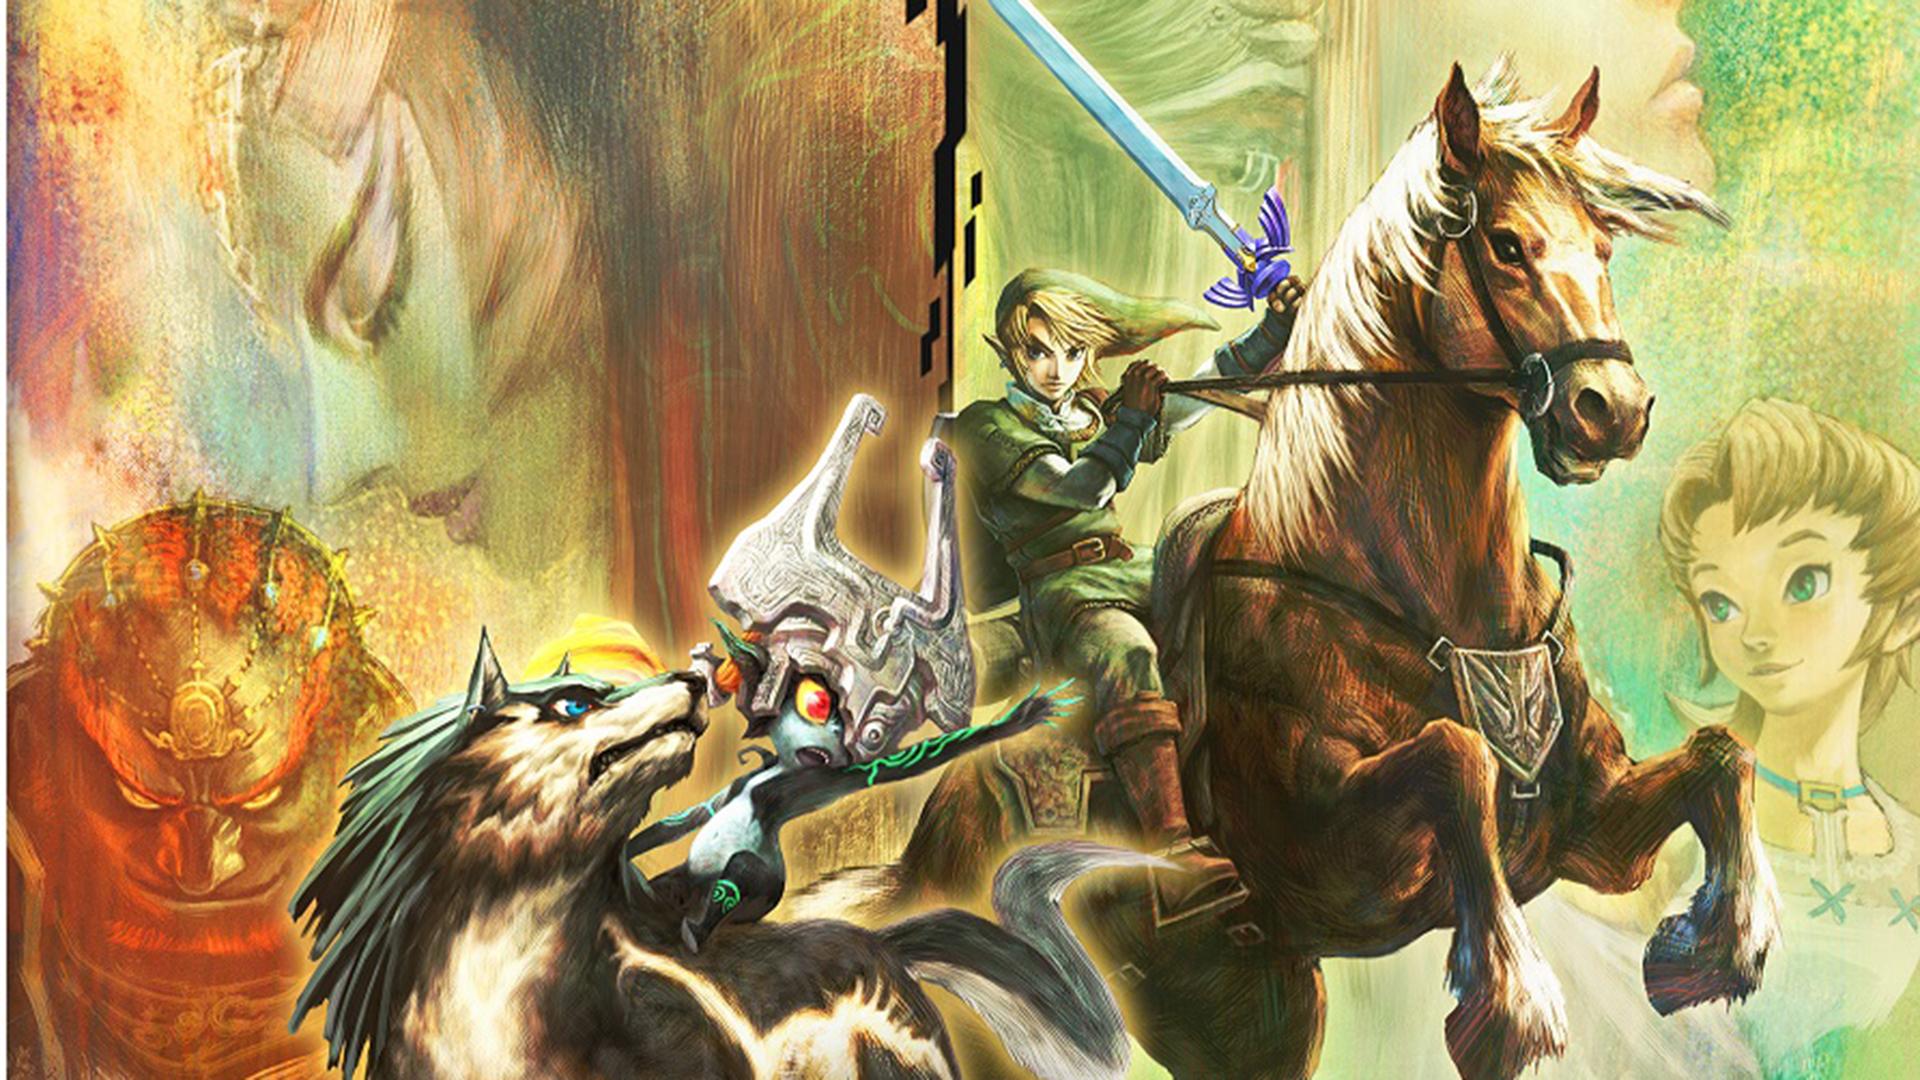 Free Download The Legend Of Zelda Twilight Princess Hd Wallpaper